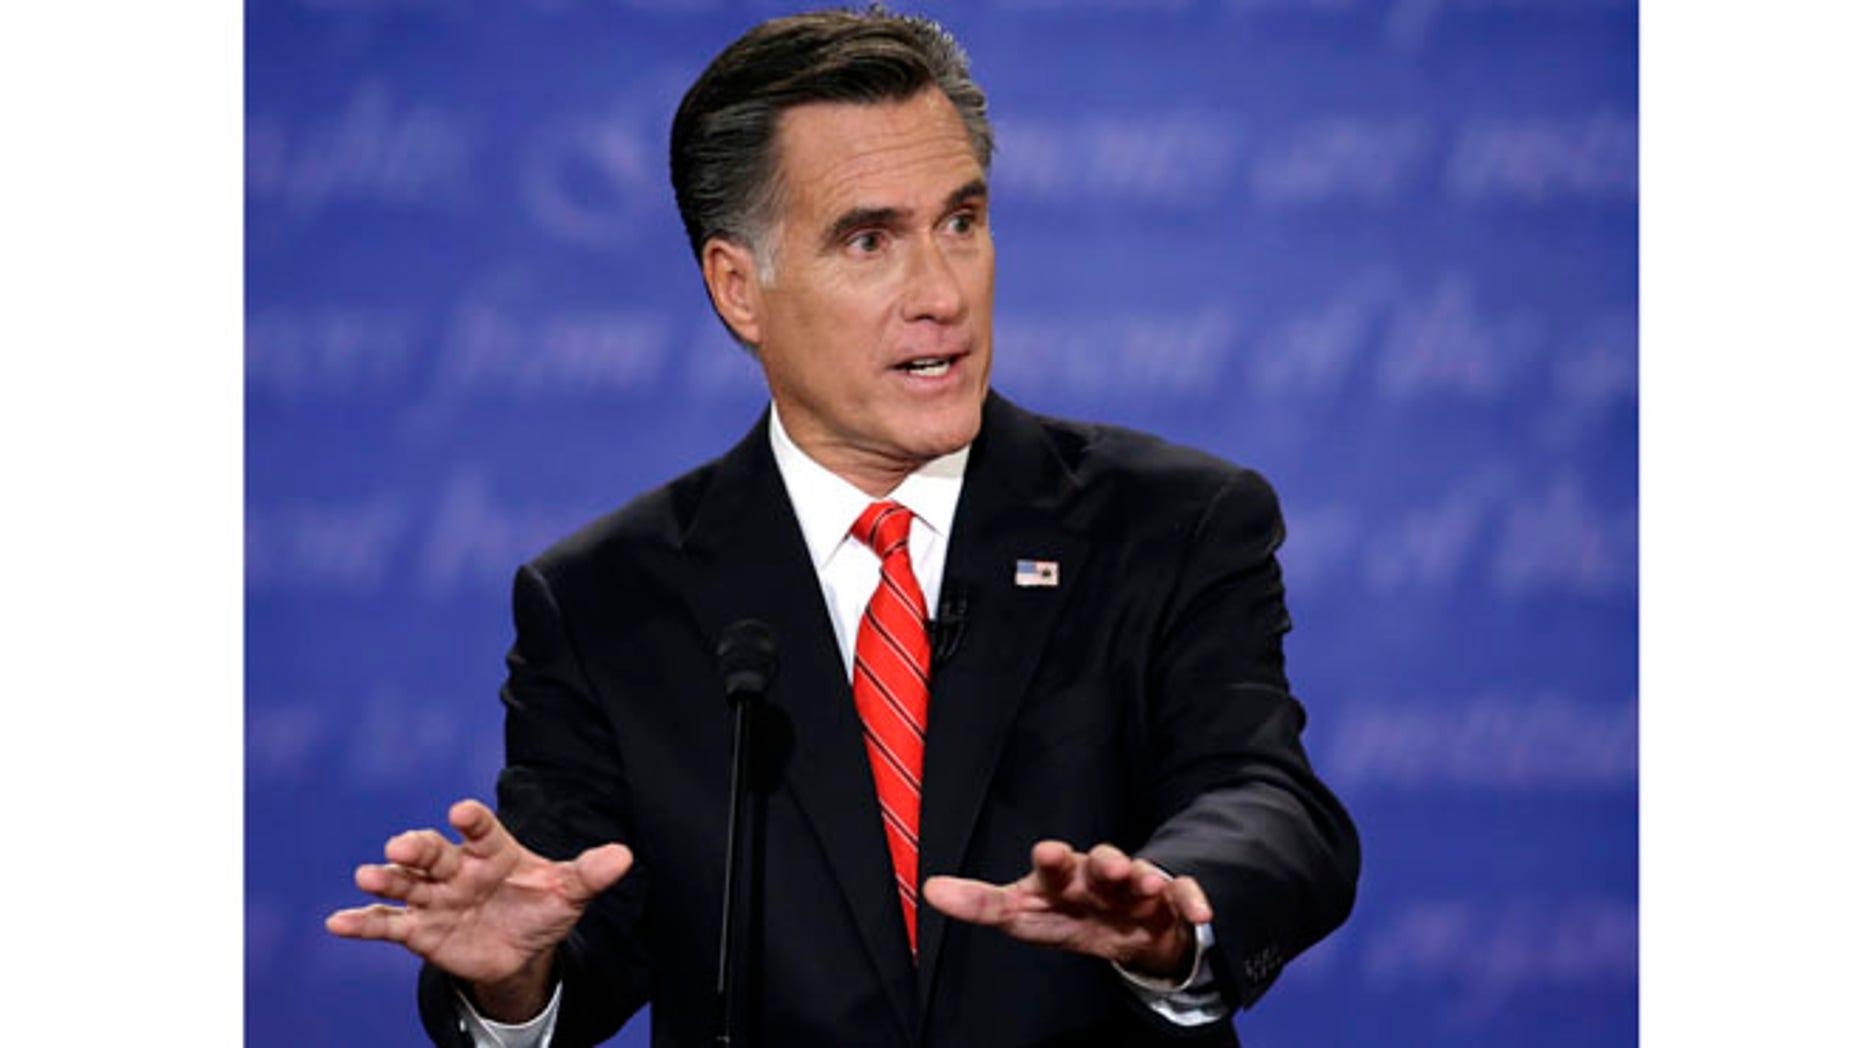 Oct. 3, 2012: Mitt Romney speaks during the first presidential debate.